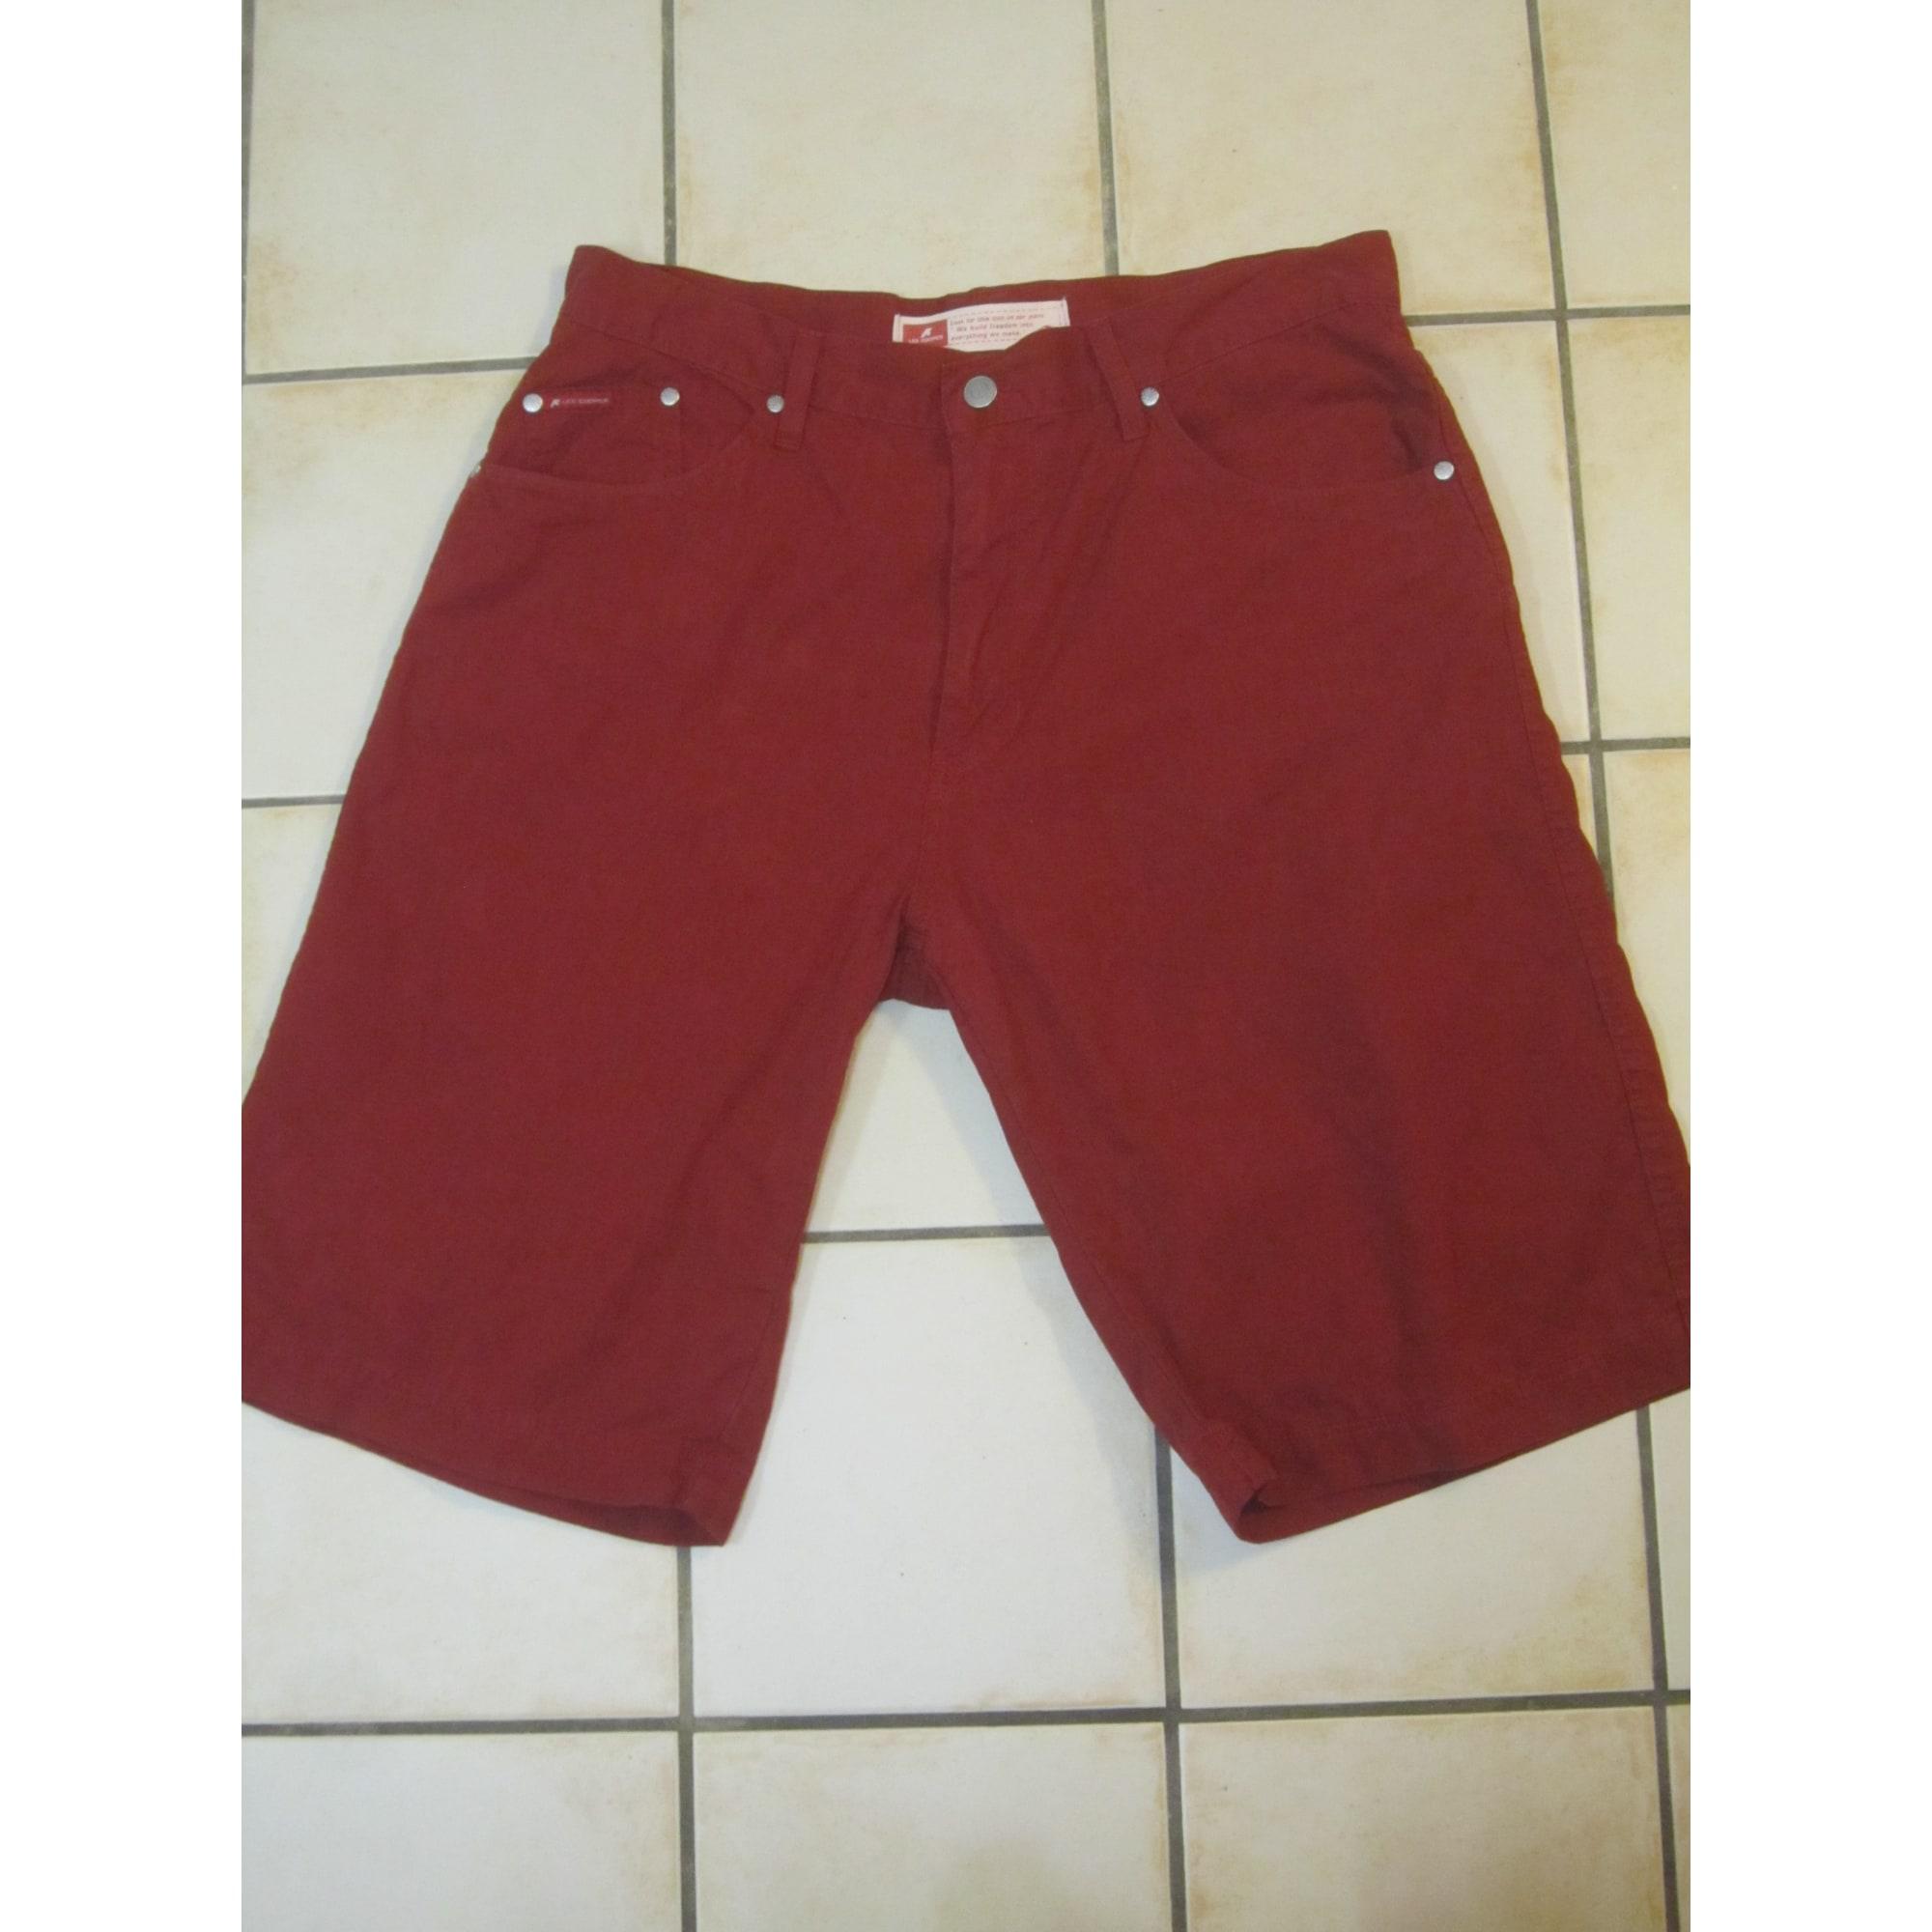 Bermuda LEE COOPER 54 (L) rouge - 6439018 4c5e8d96788